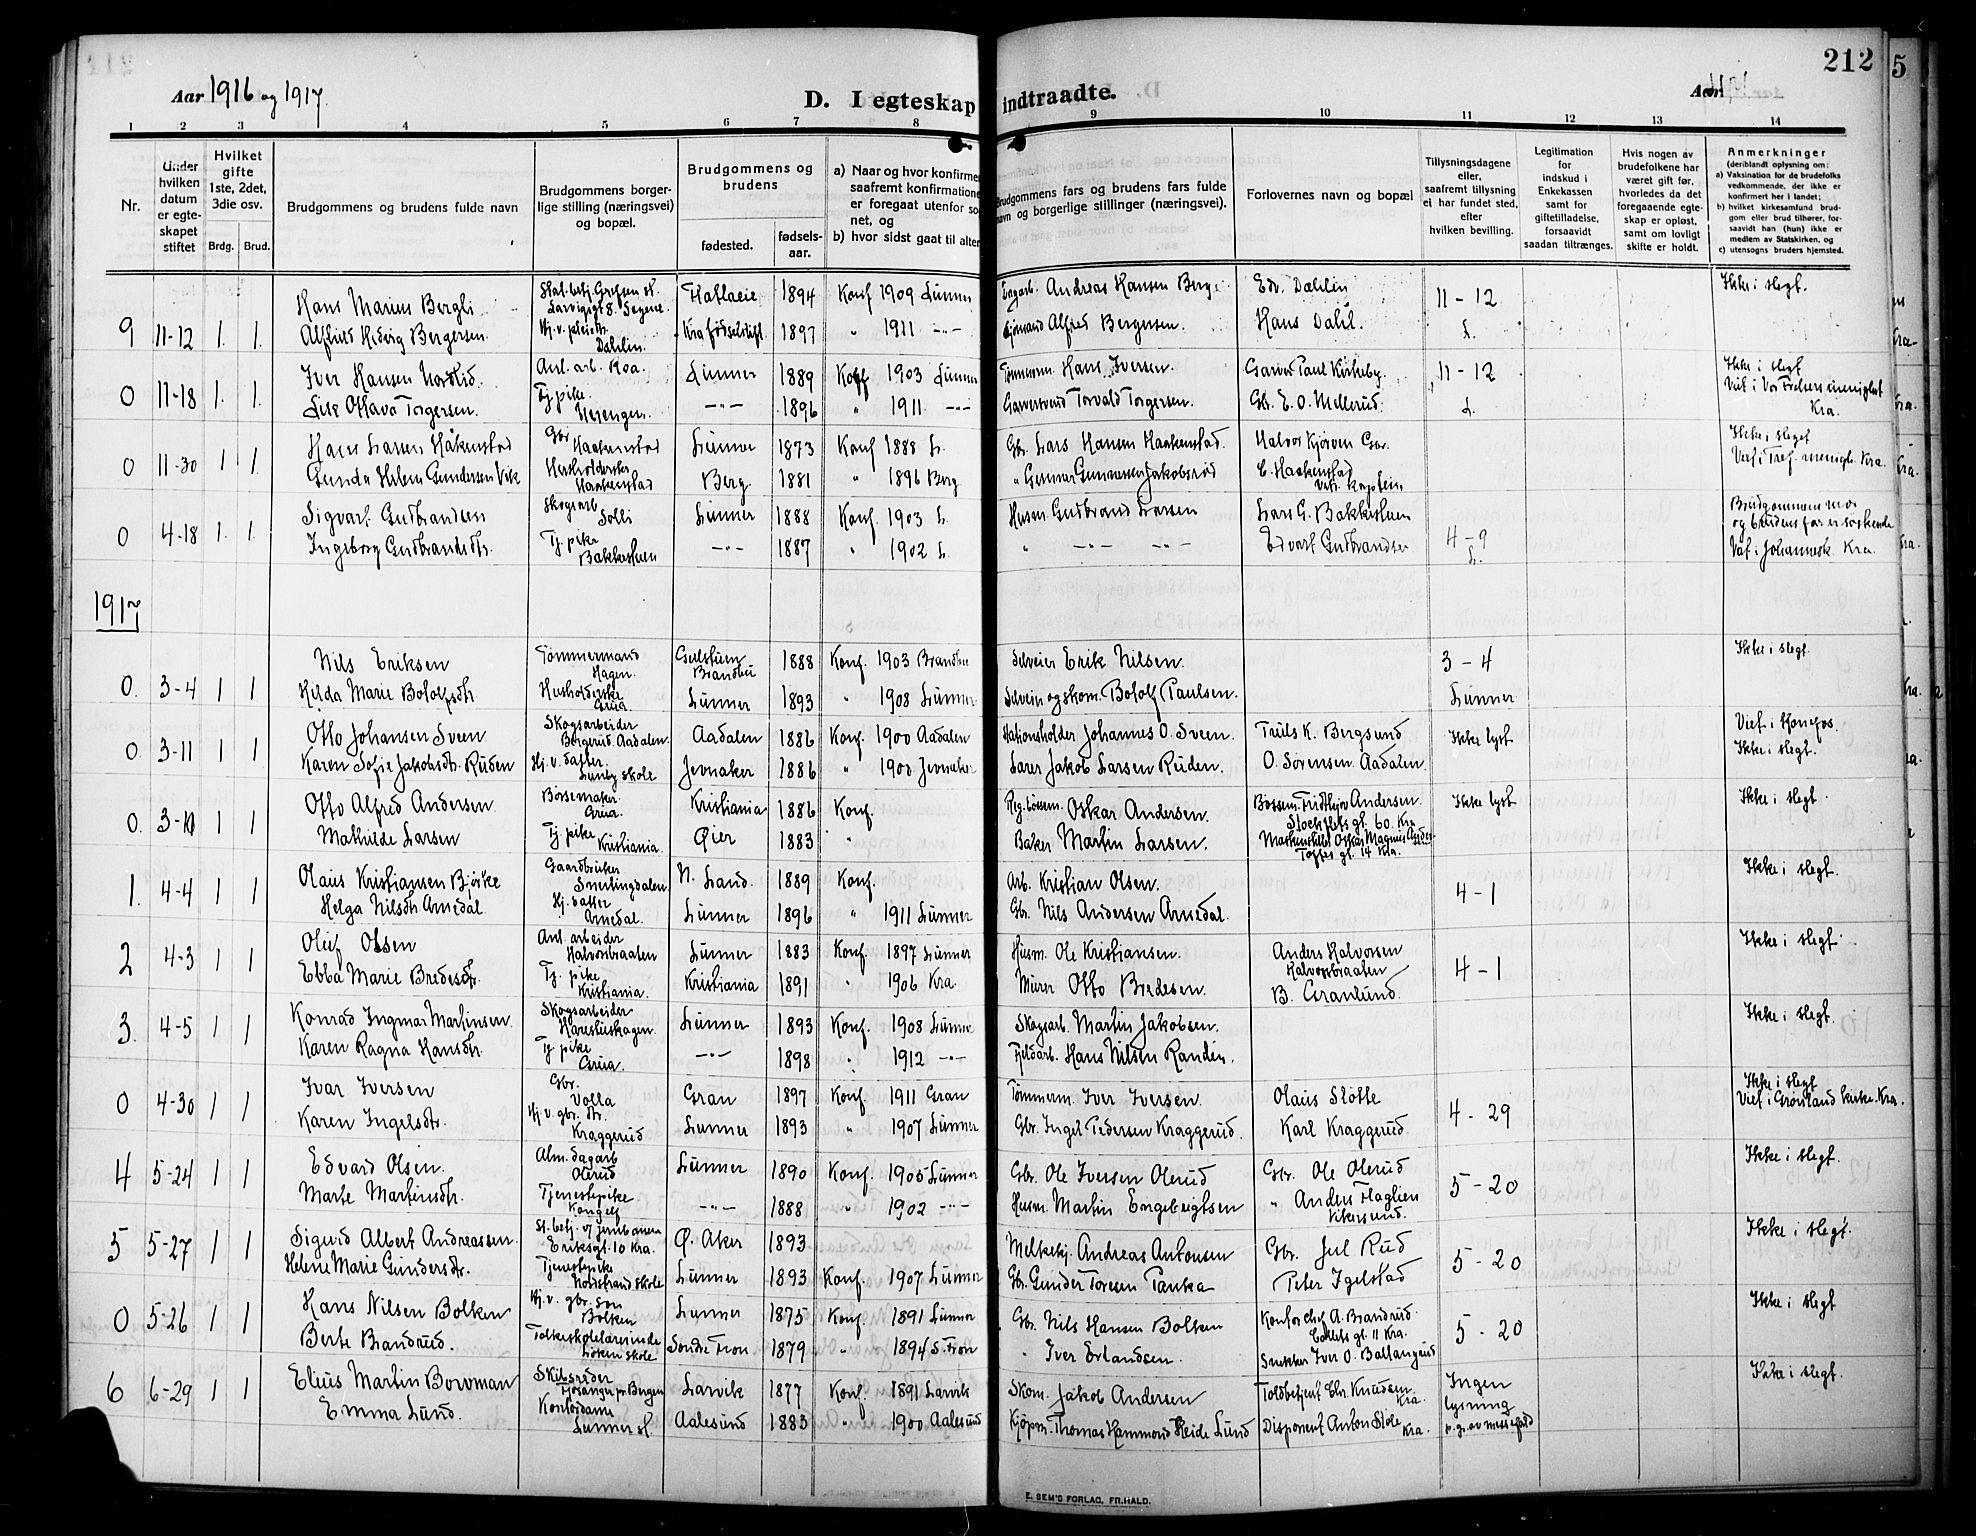 SAH, Lunner prestekontor, H/Ha/Hab/L0001: Klokkerbok nr. 1, 1909-1922, s. 212